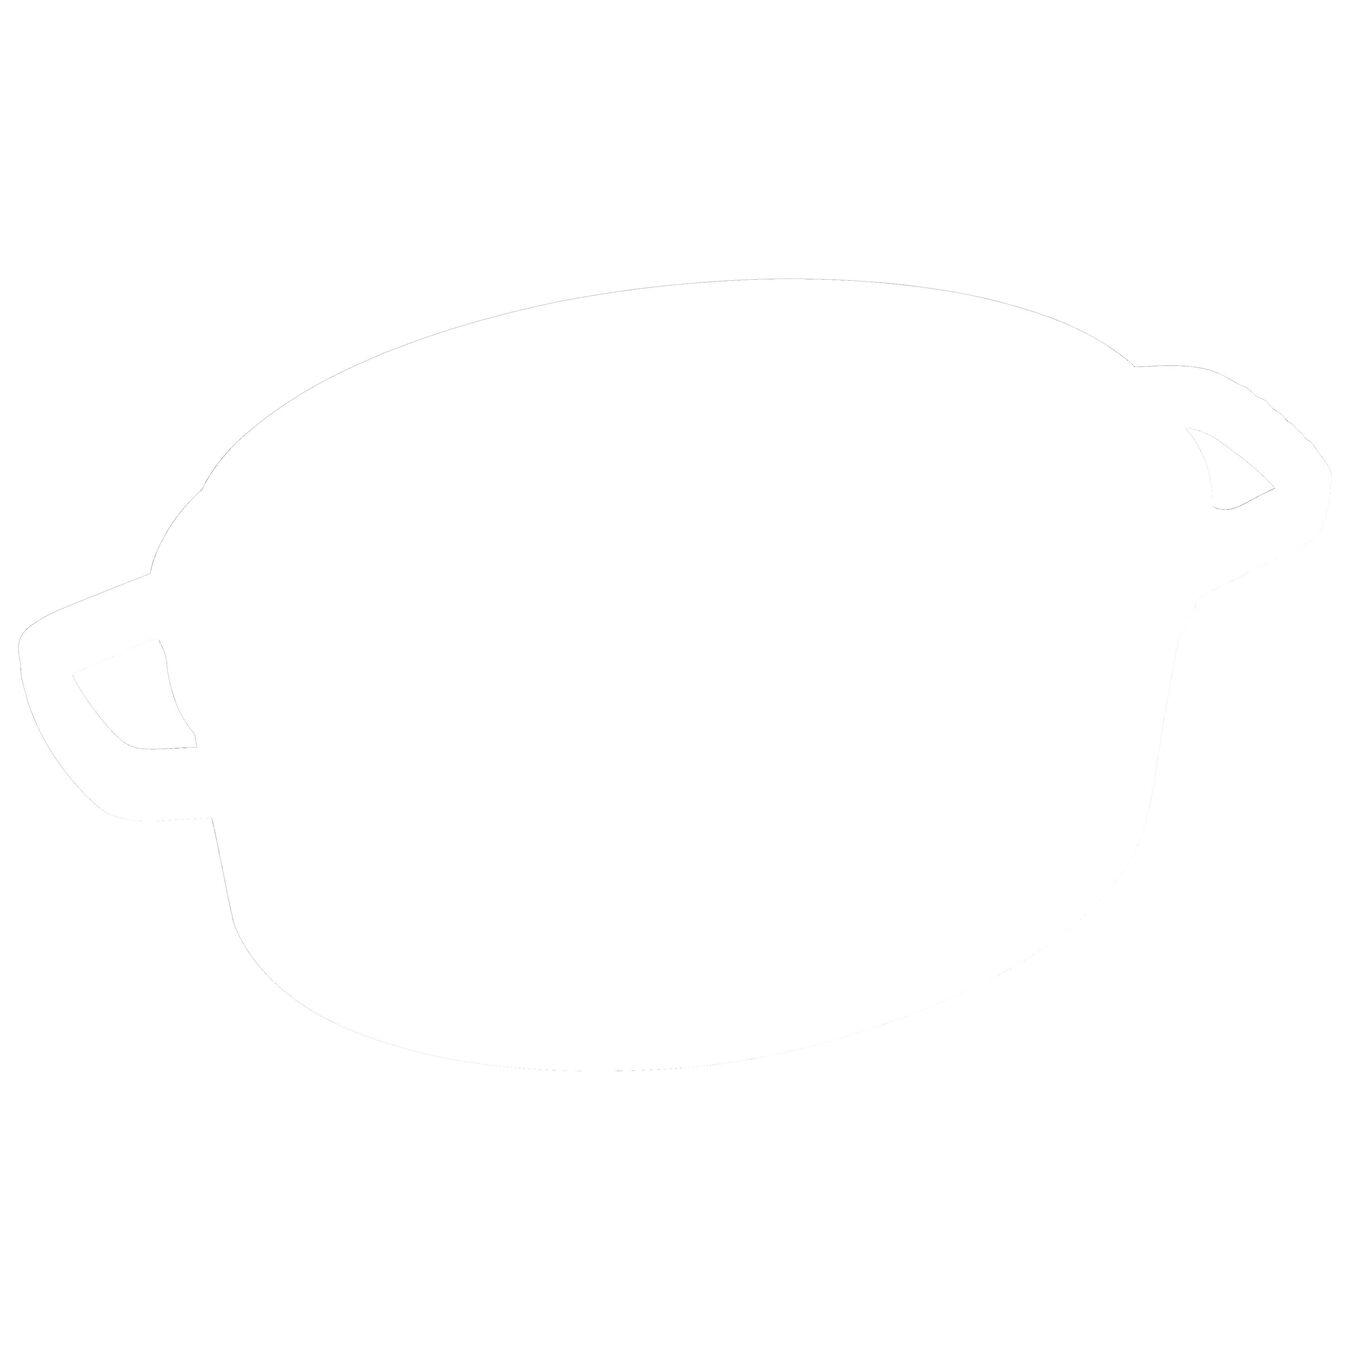 Cocotte 29 cm, Ovale, Cannelle, Fonte,,large 1